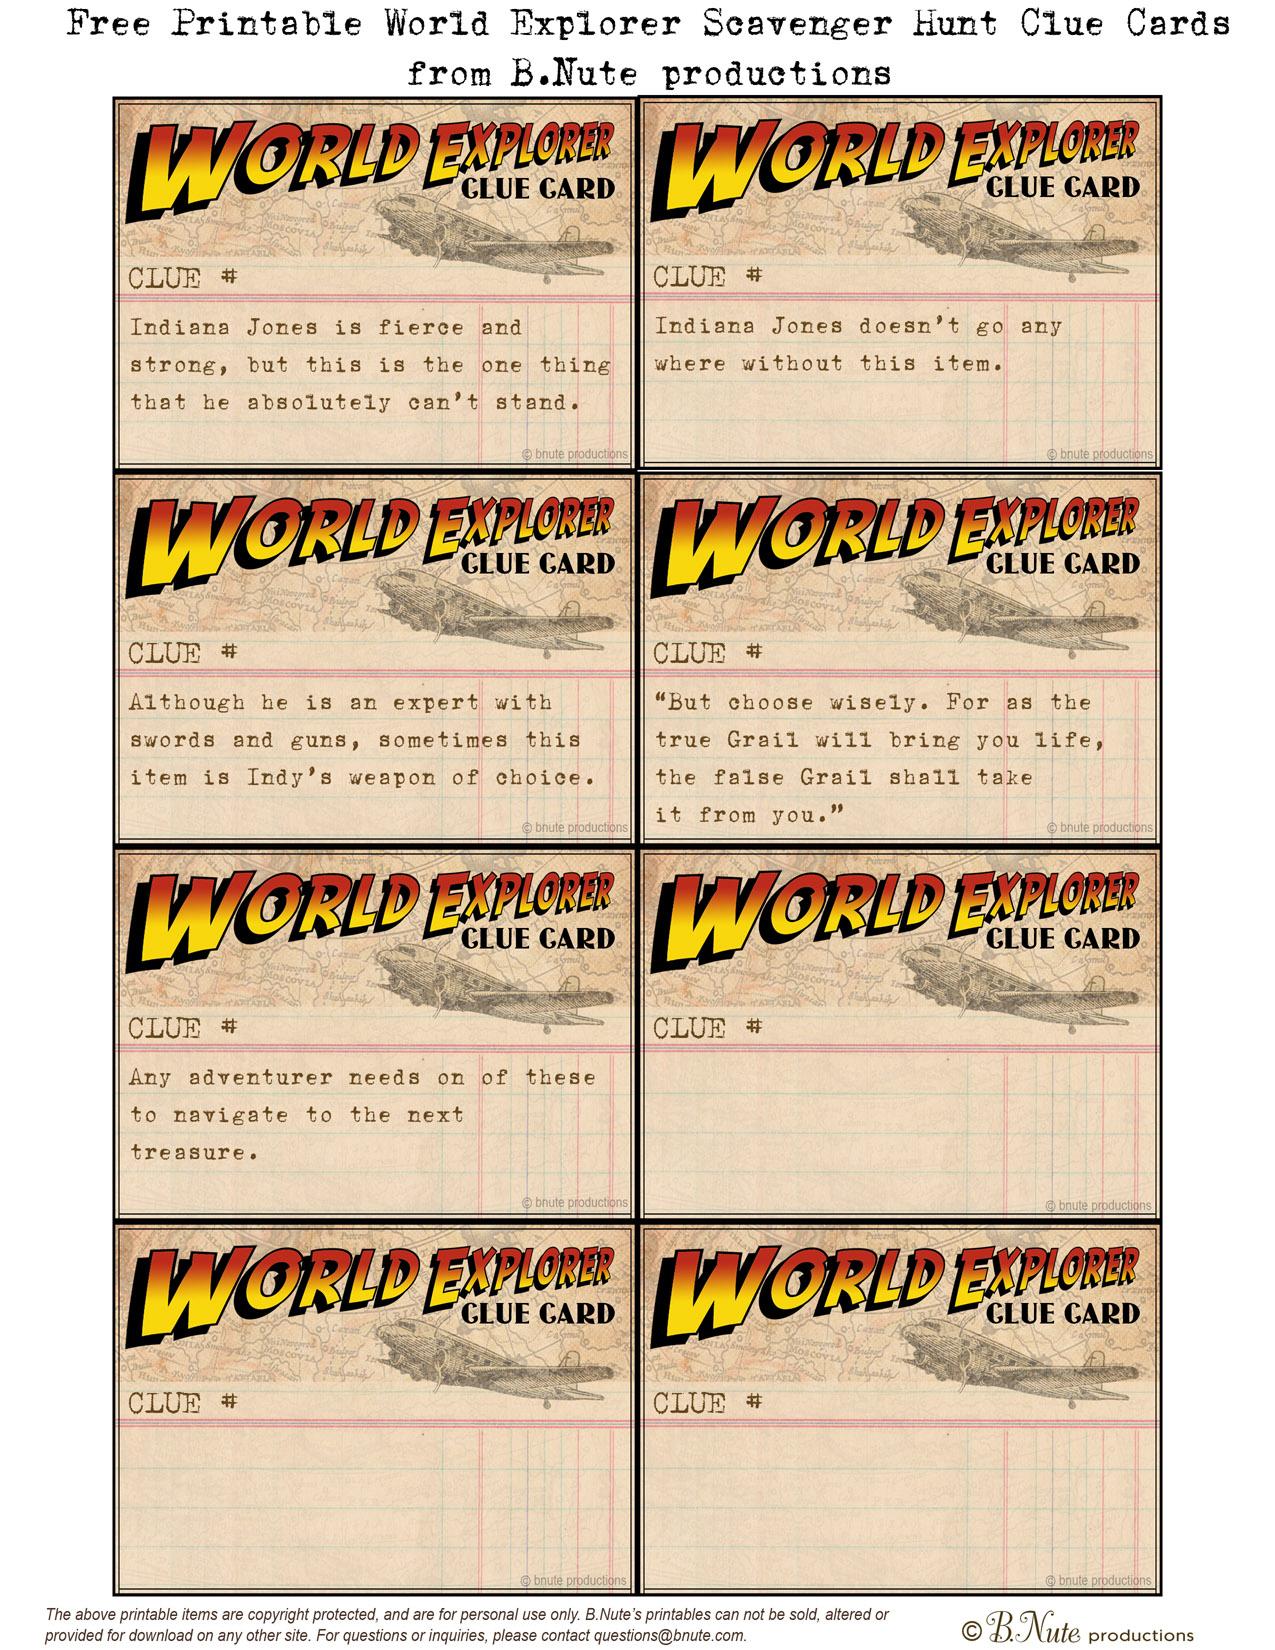 Bnute Productions Free Printable World Explorer Indiana Jones Scavenger Hunt Game